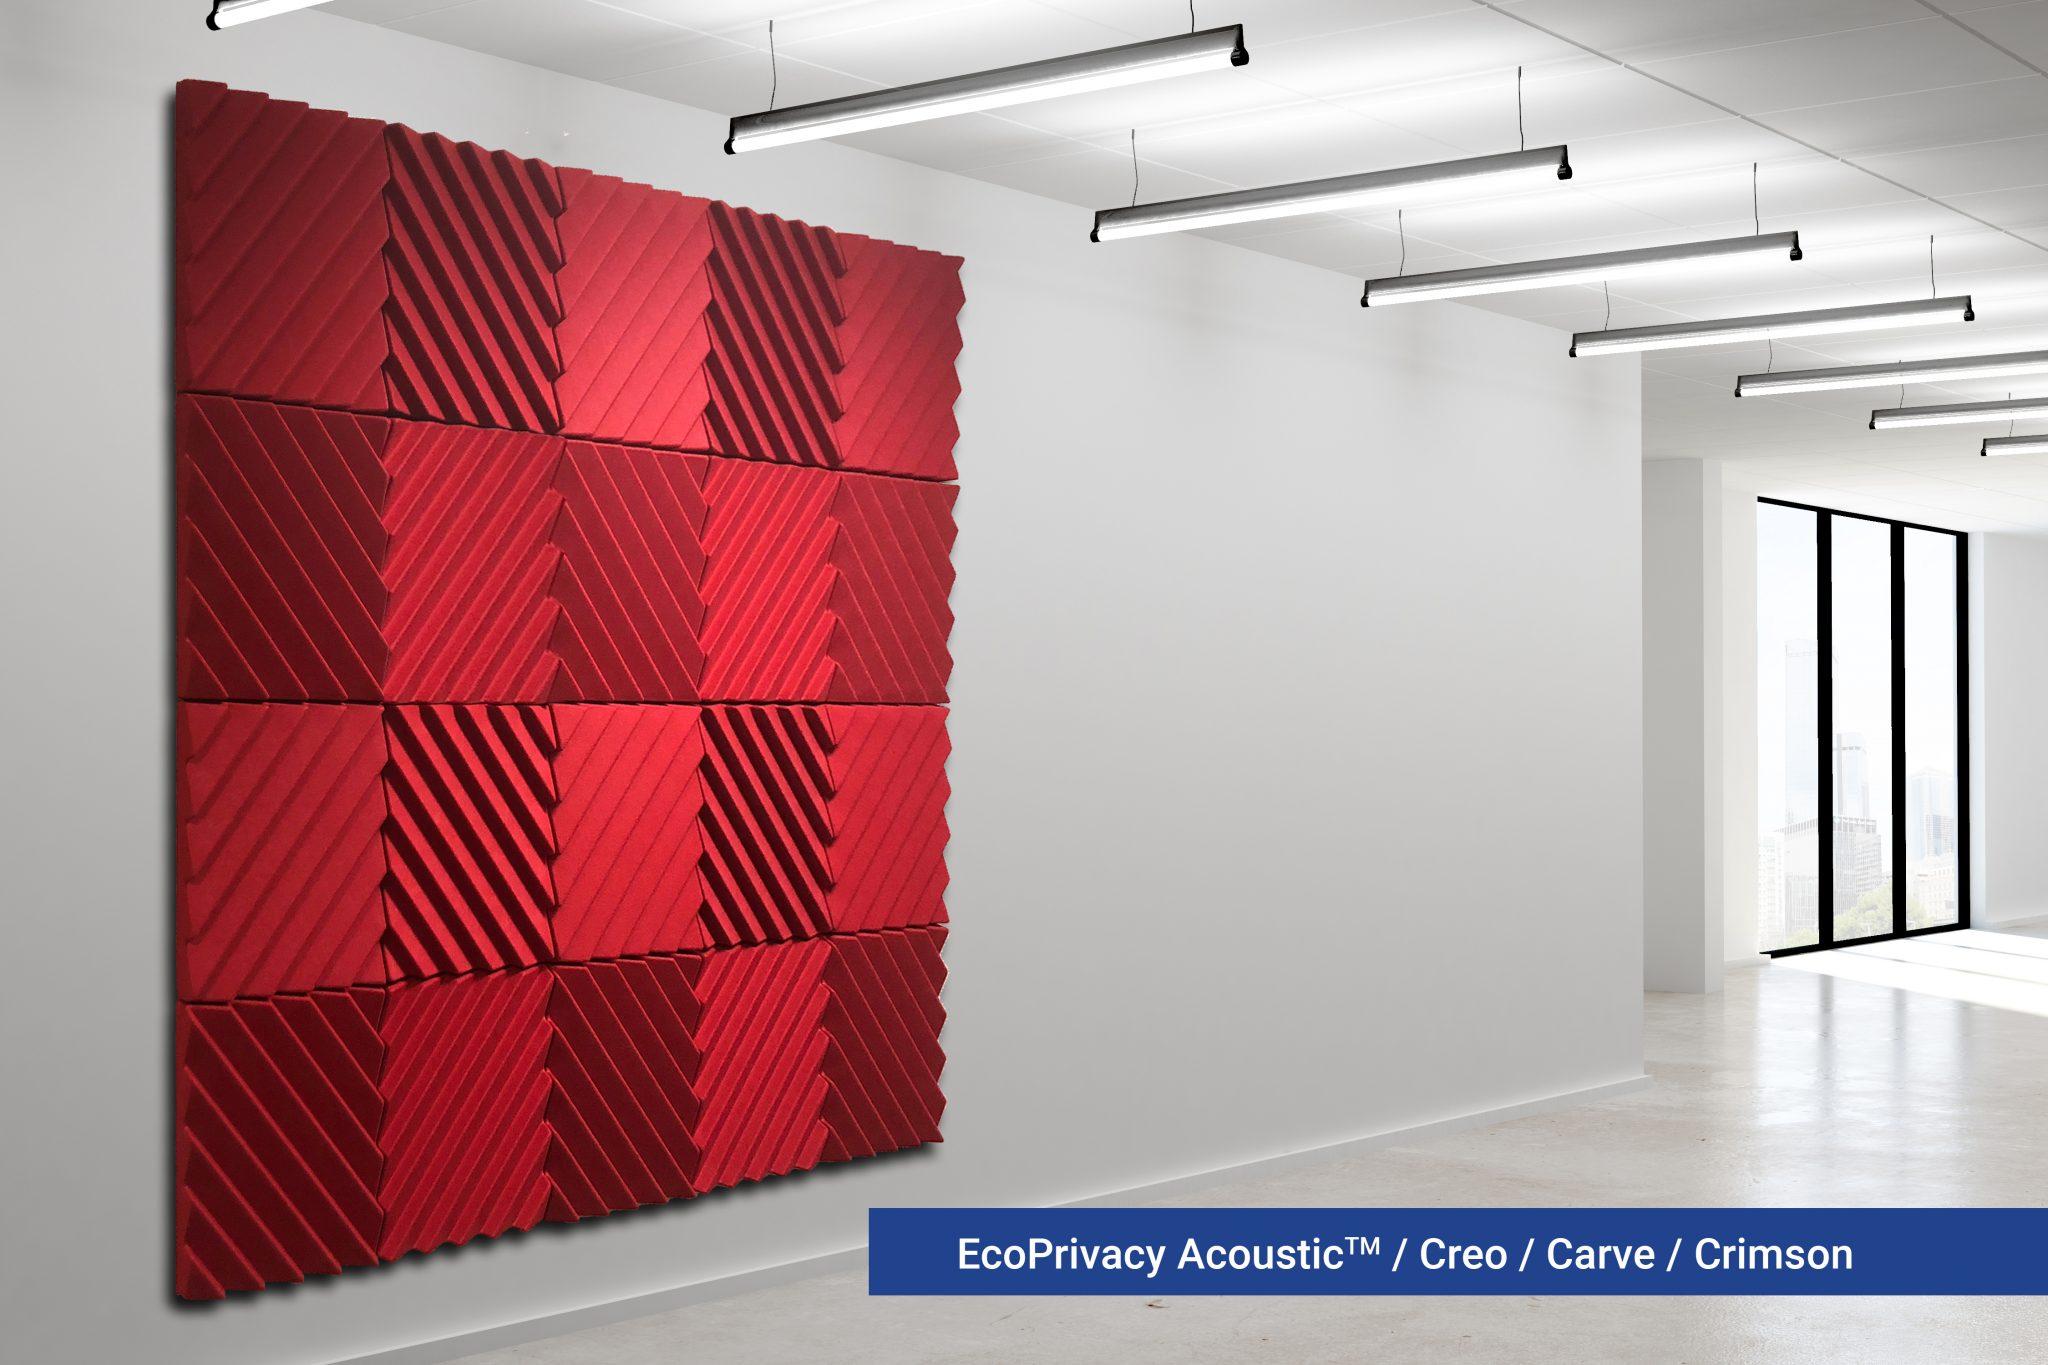 Creo-Carve-Crimson-309-2-20180926-1.jpg